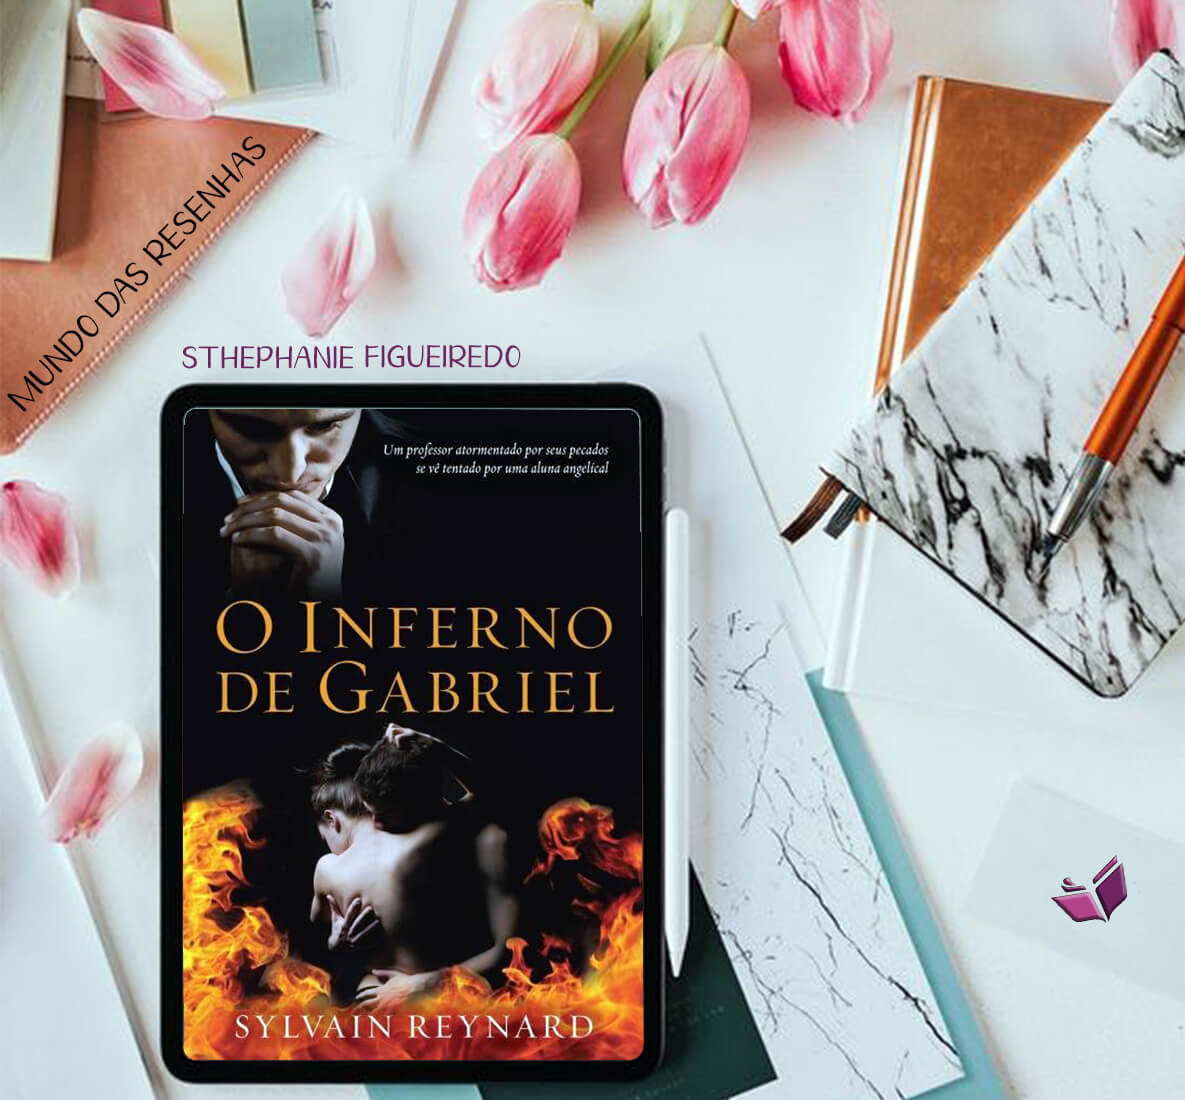 O INFERNO DE GABRIEL – SYLVAIN REYNARD